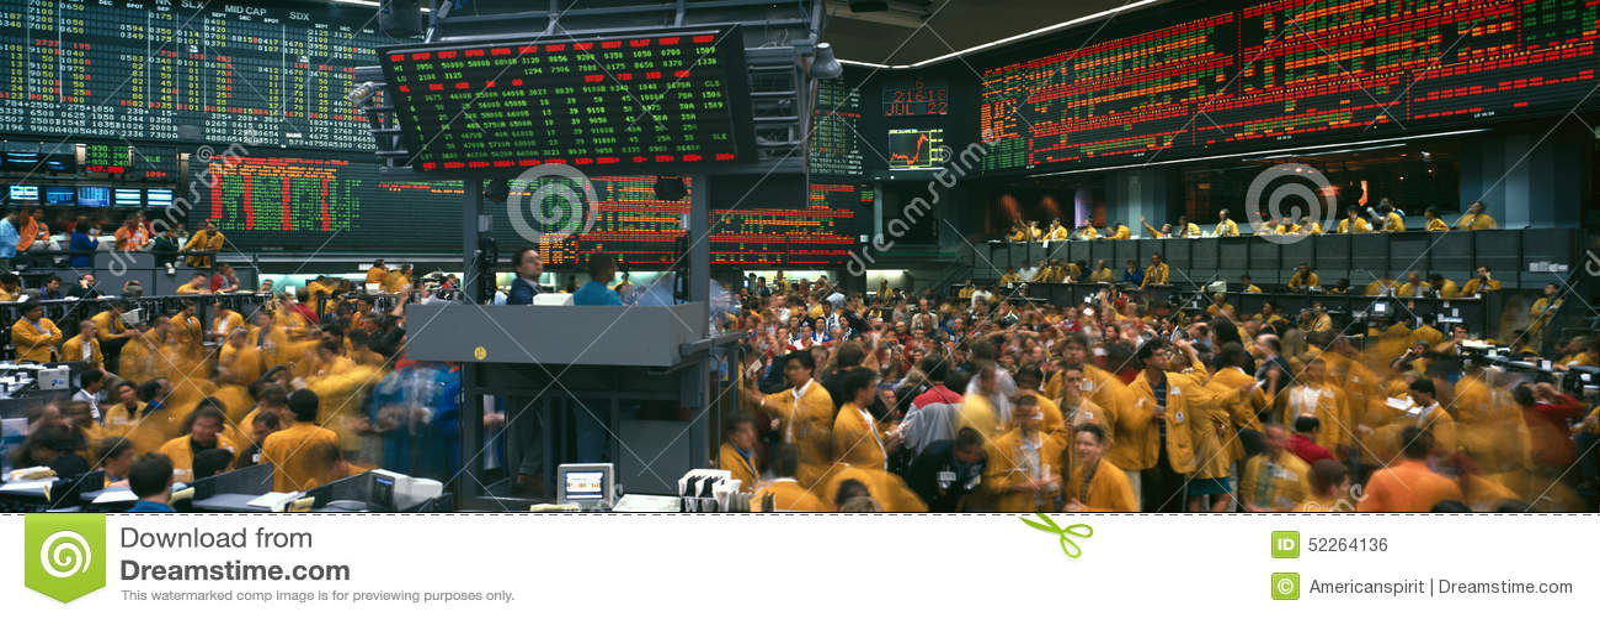 Vista panorâmica da troca de Chicago Mercantile